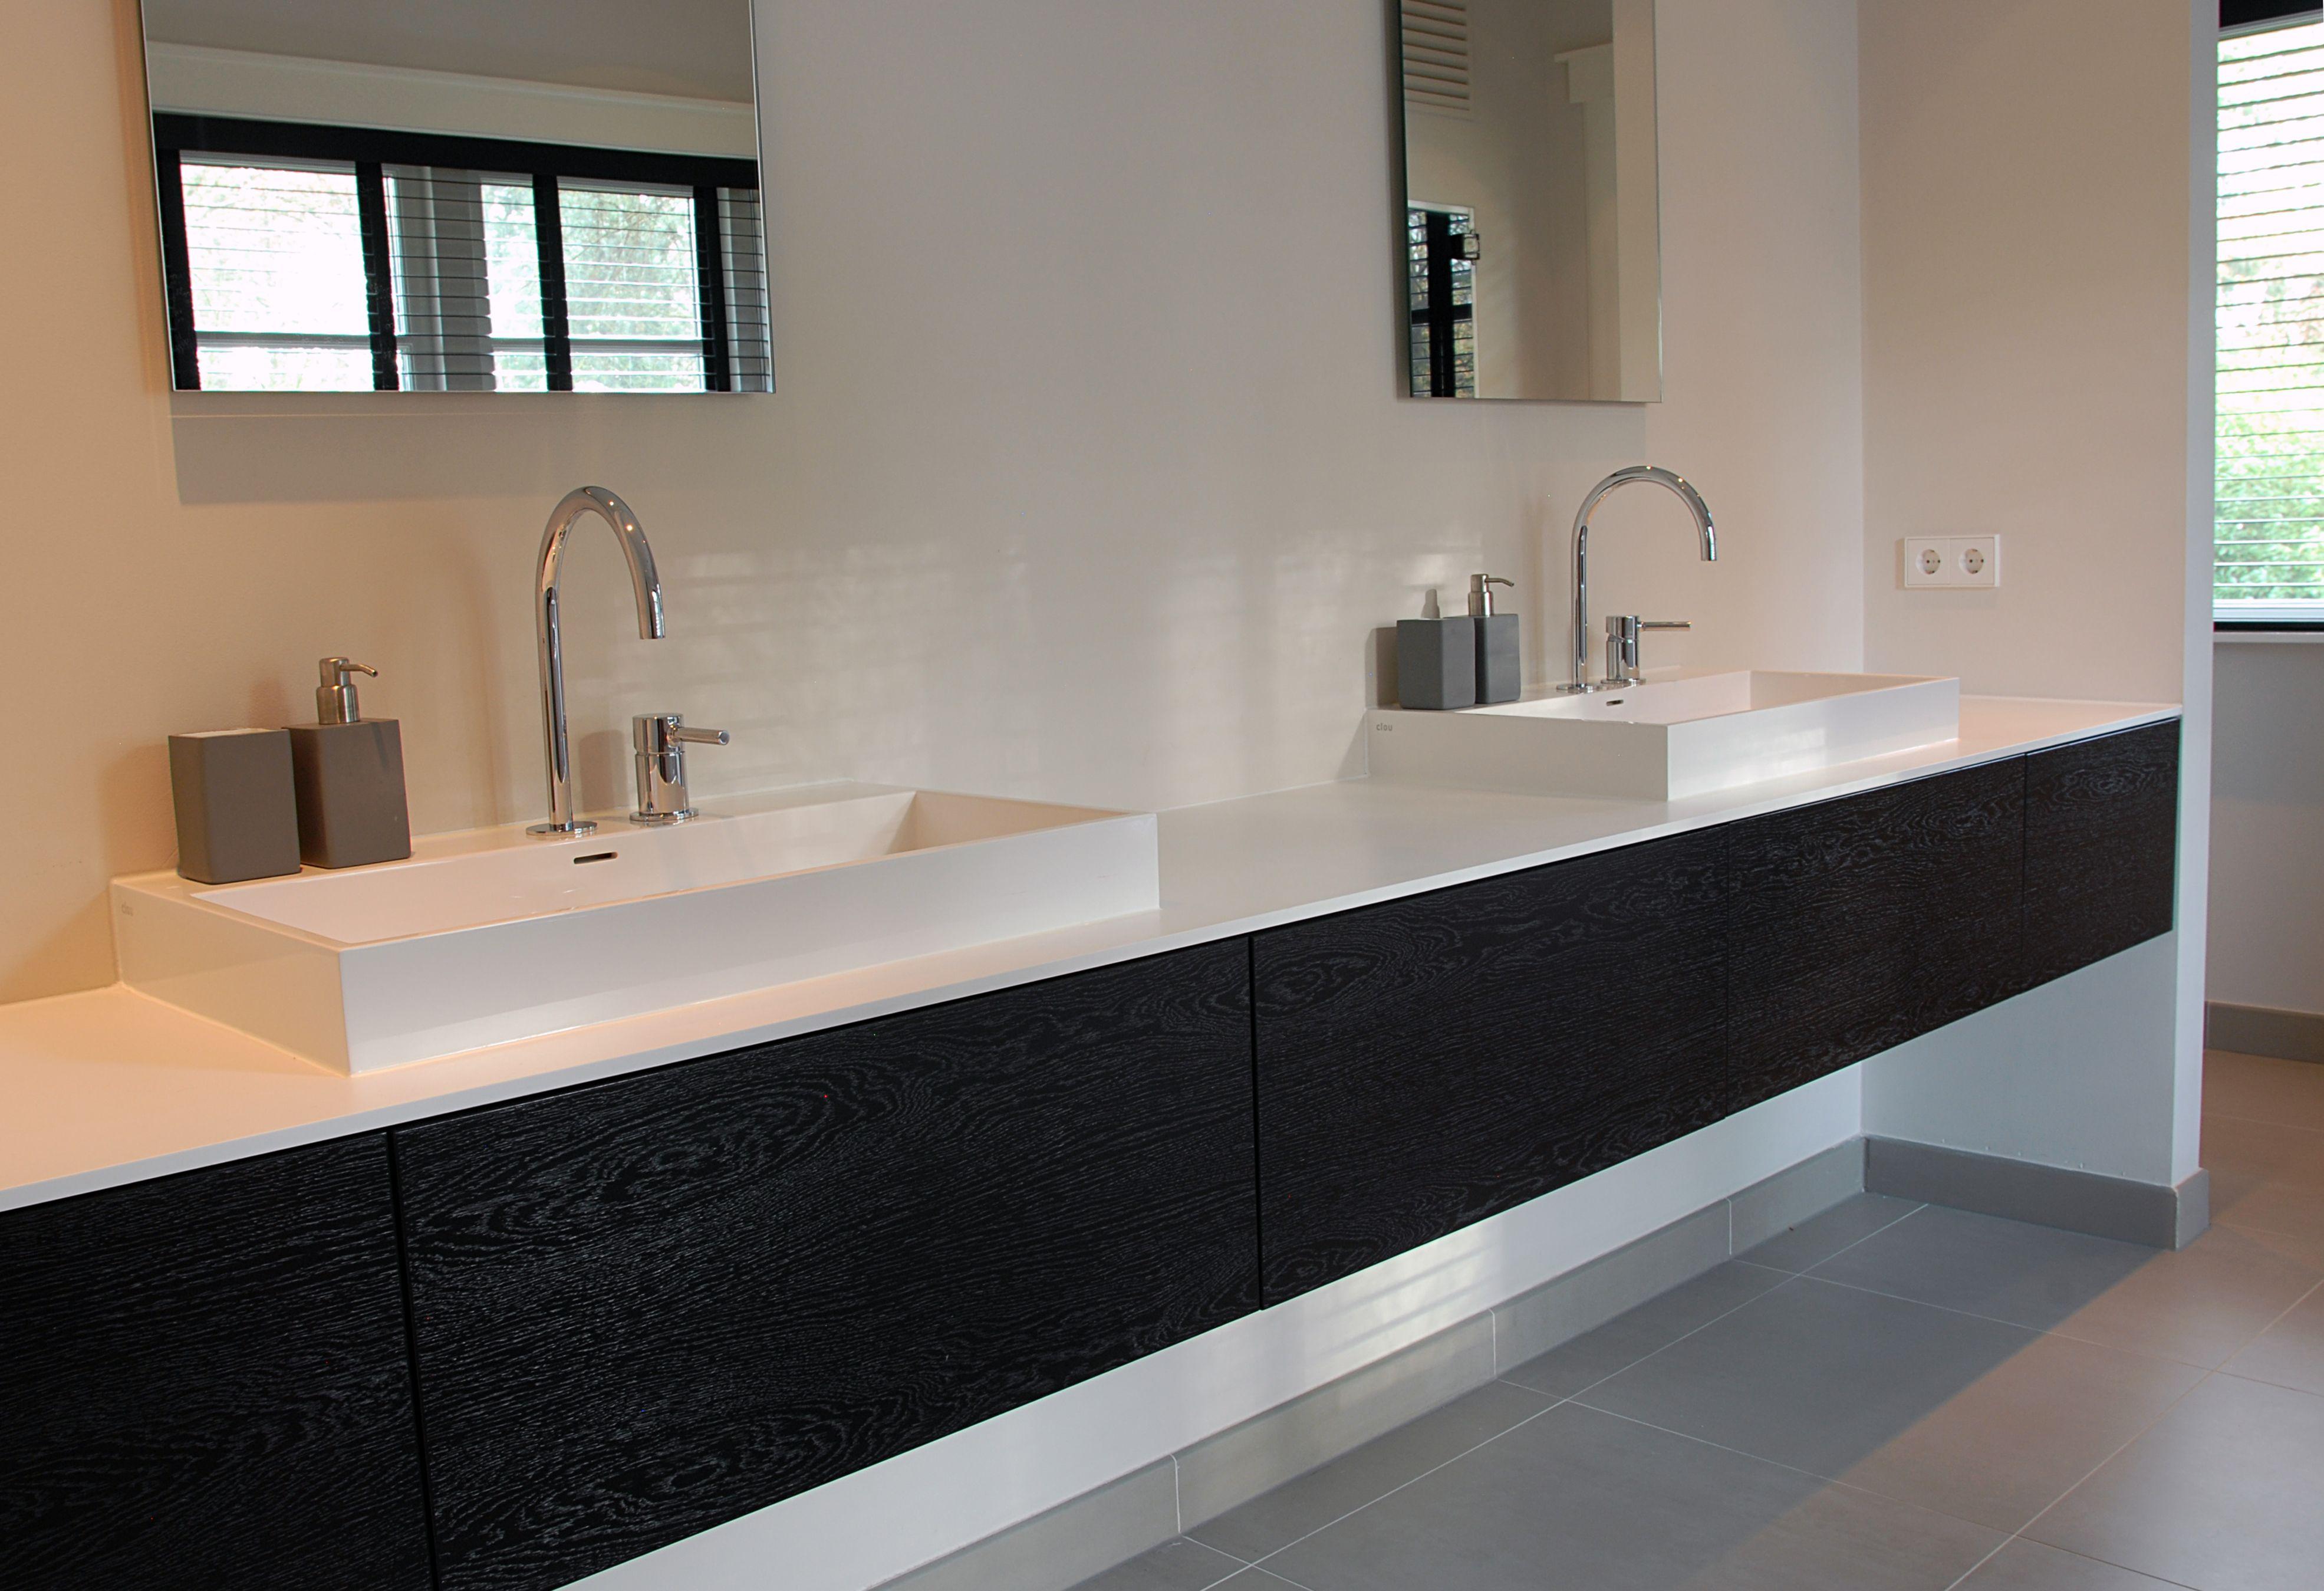 martijn veldman interior design badkamers pinterest rh pinterest com